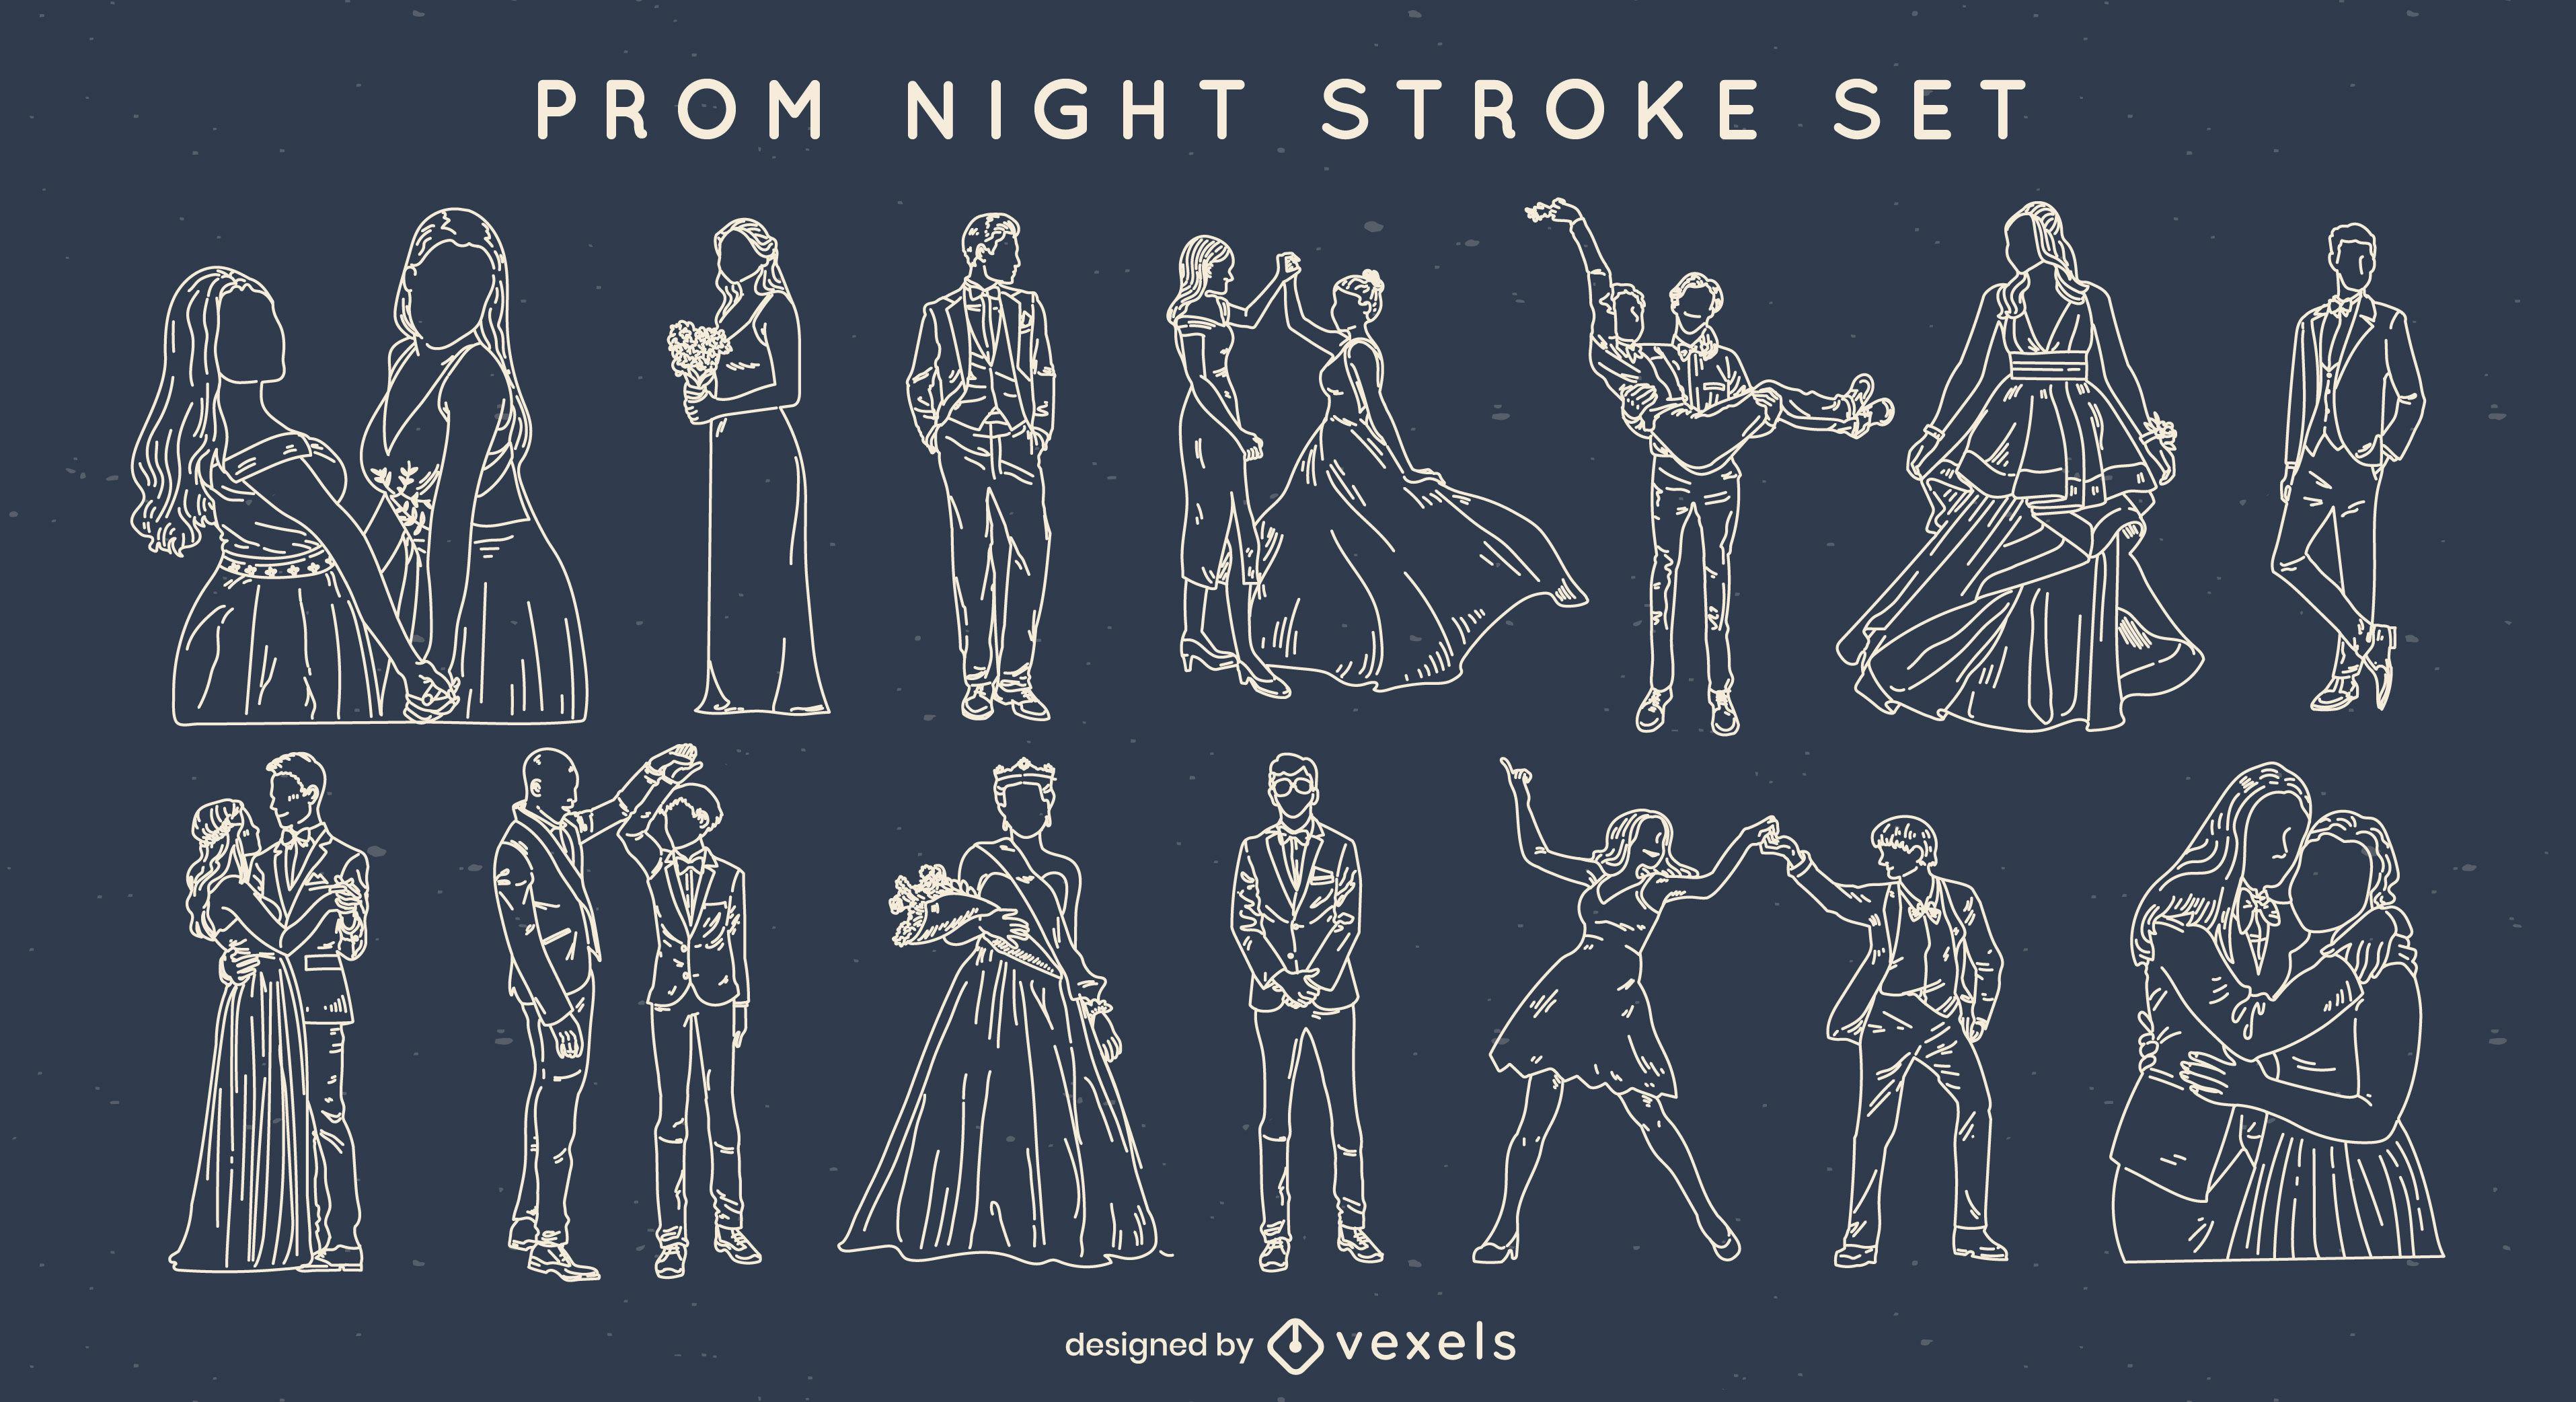 Prom night stroke elements set